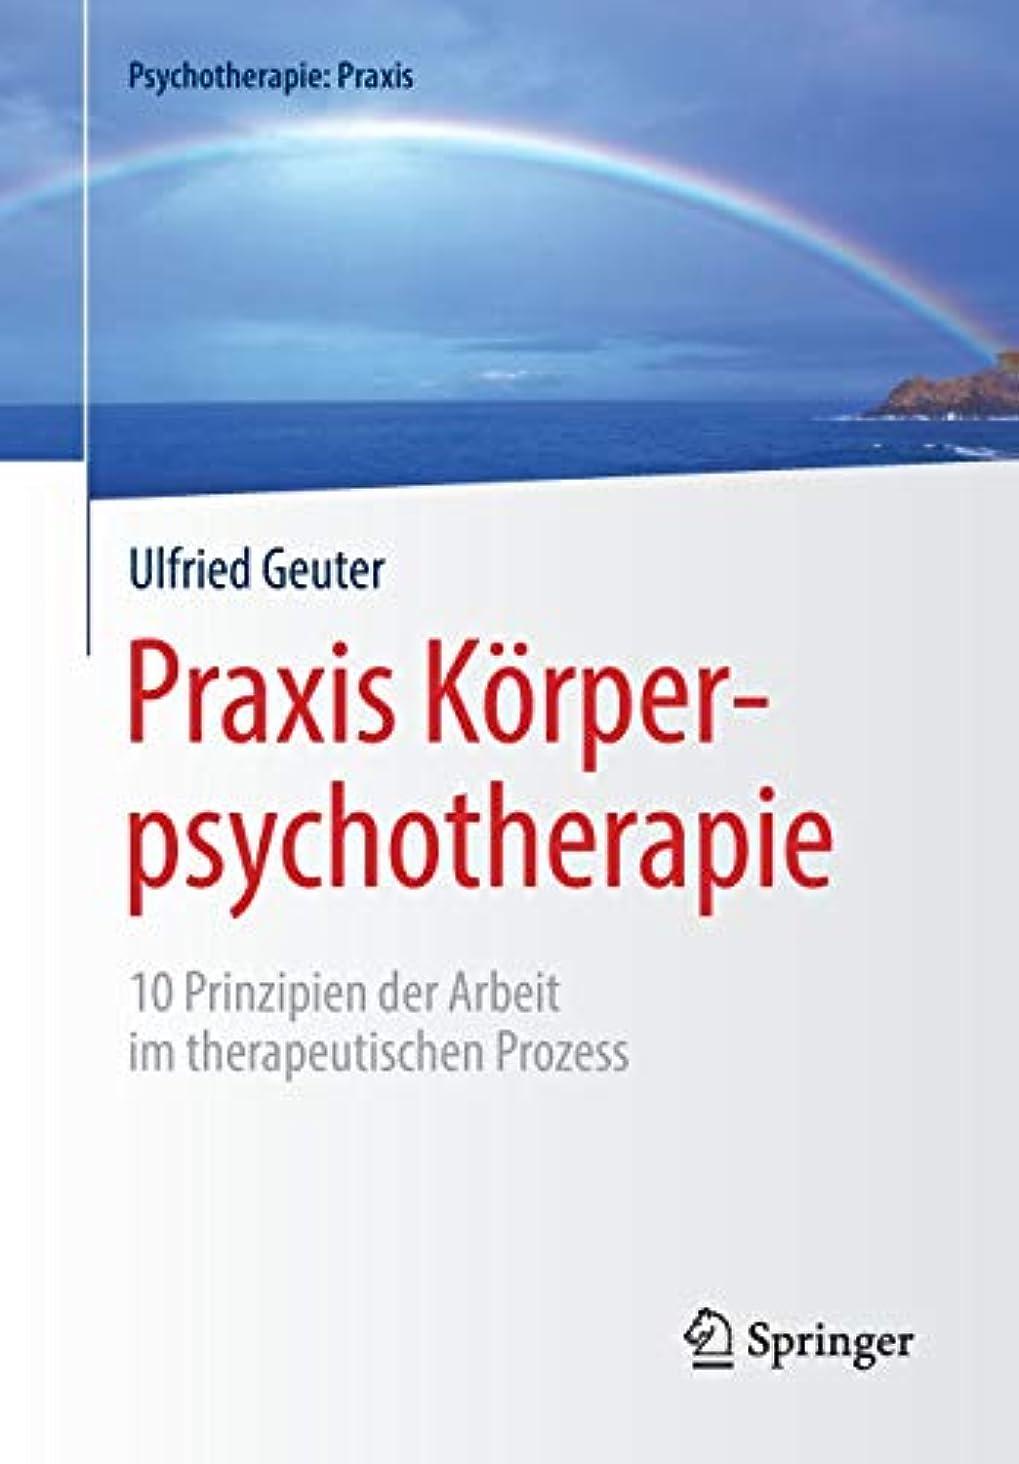 魂赤道マウンドPraxis Koerperpsychotherapie: 10 Prinzipien der Arbeit im therapeutischen Prozess (Psychotherapie: Praxis)